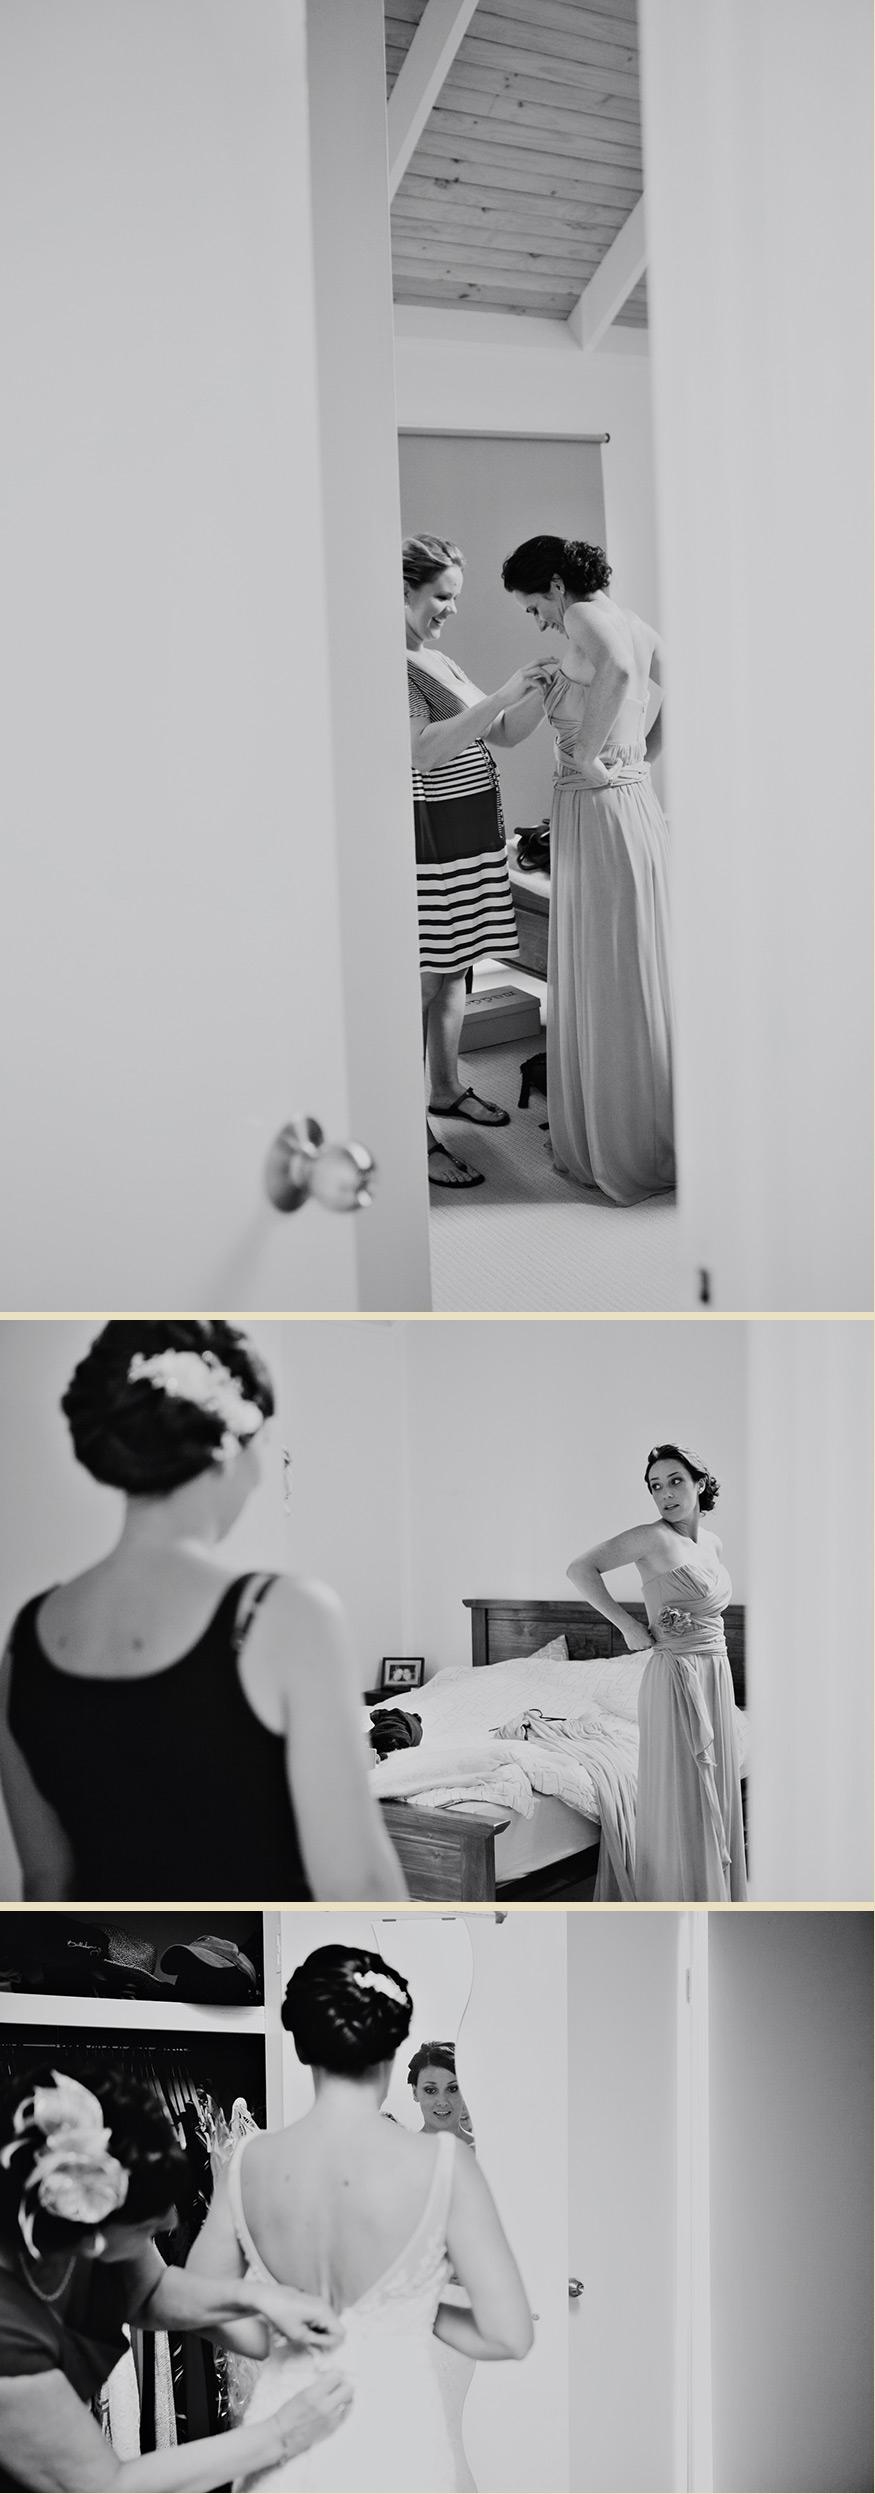 Brisbane Wedding Phoographer Blog-collage-1332891488197